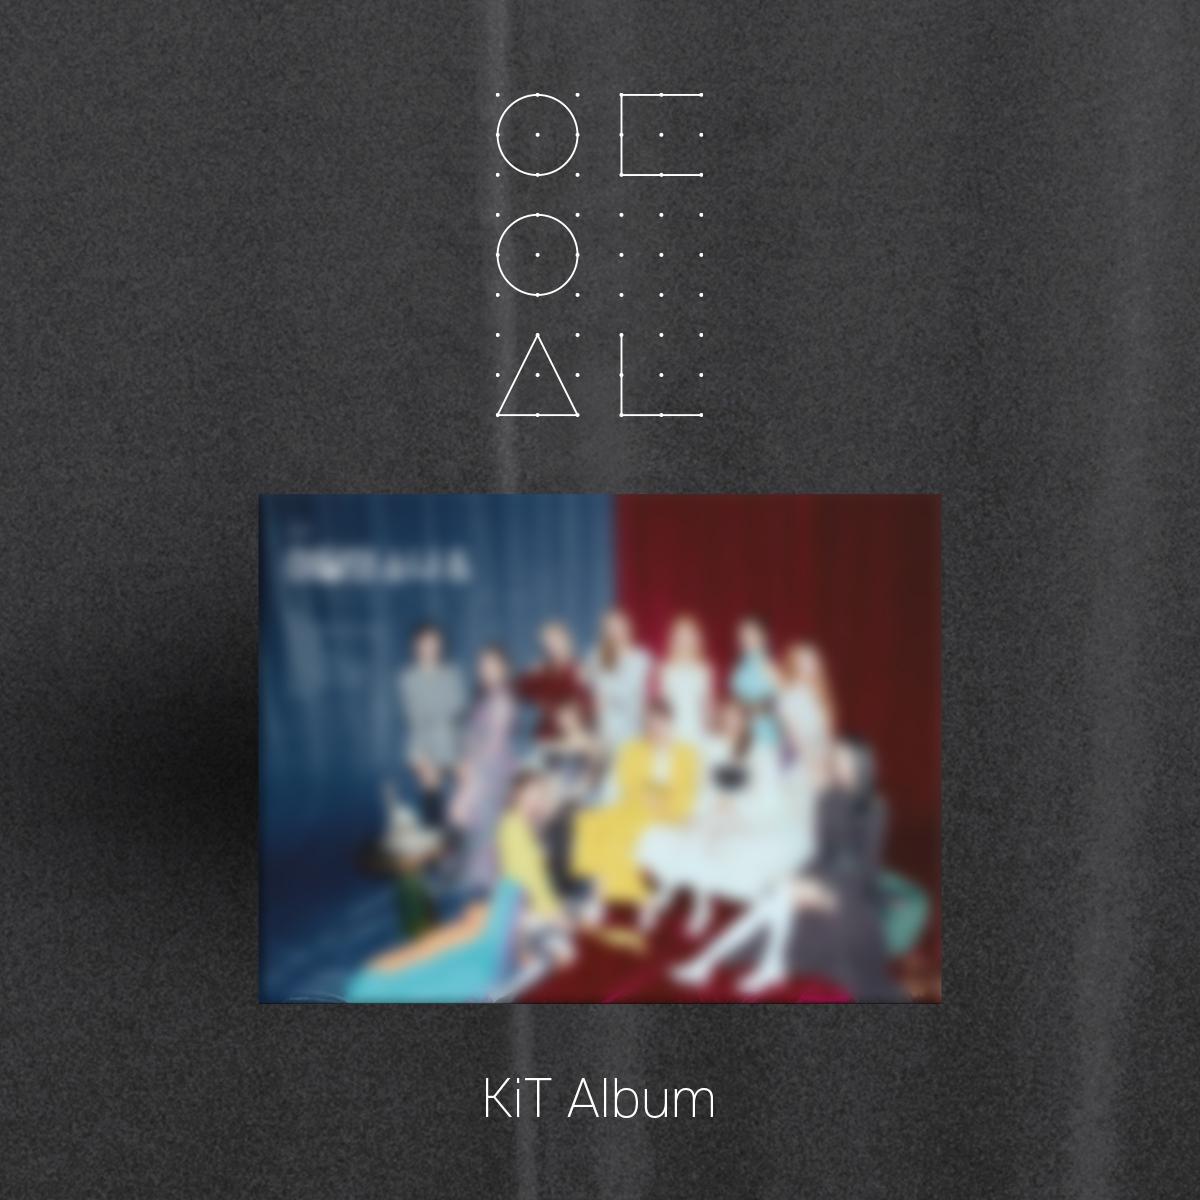 🌙 Collaboration X @loonaboard 🌙 📀 LOONA - Mini Album Vol.4 [&] 💿 Version : A / B / C / D / SMC (Kit Ver.) 💿 Discount : 40% OFF FC LINK➡️ ktown4u.com/eventsub?eve_n…